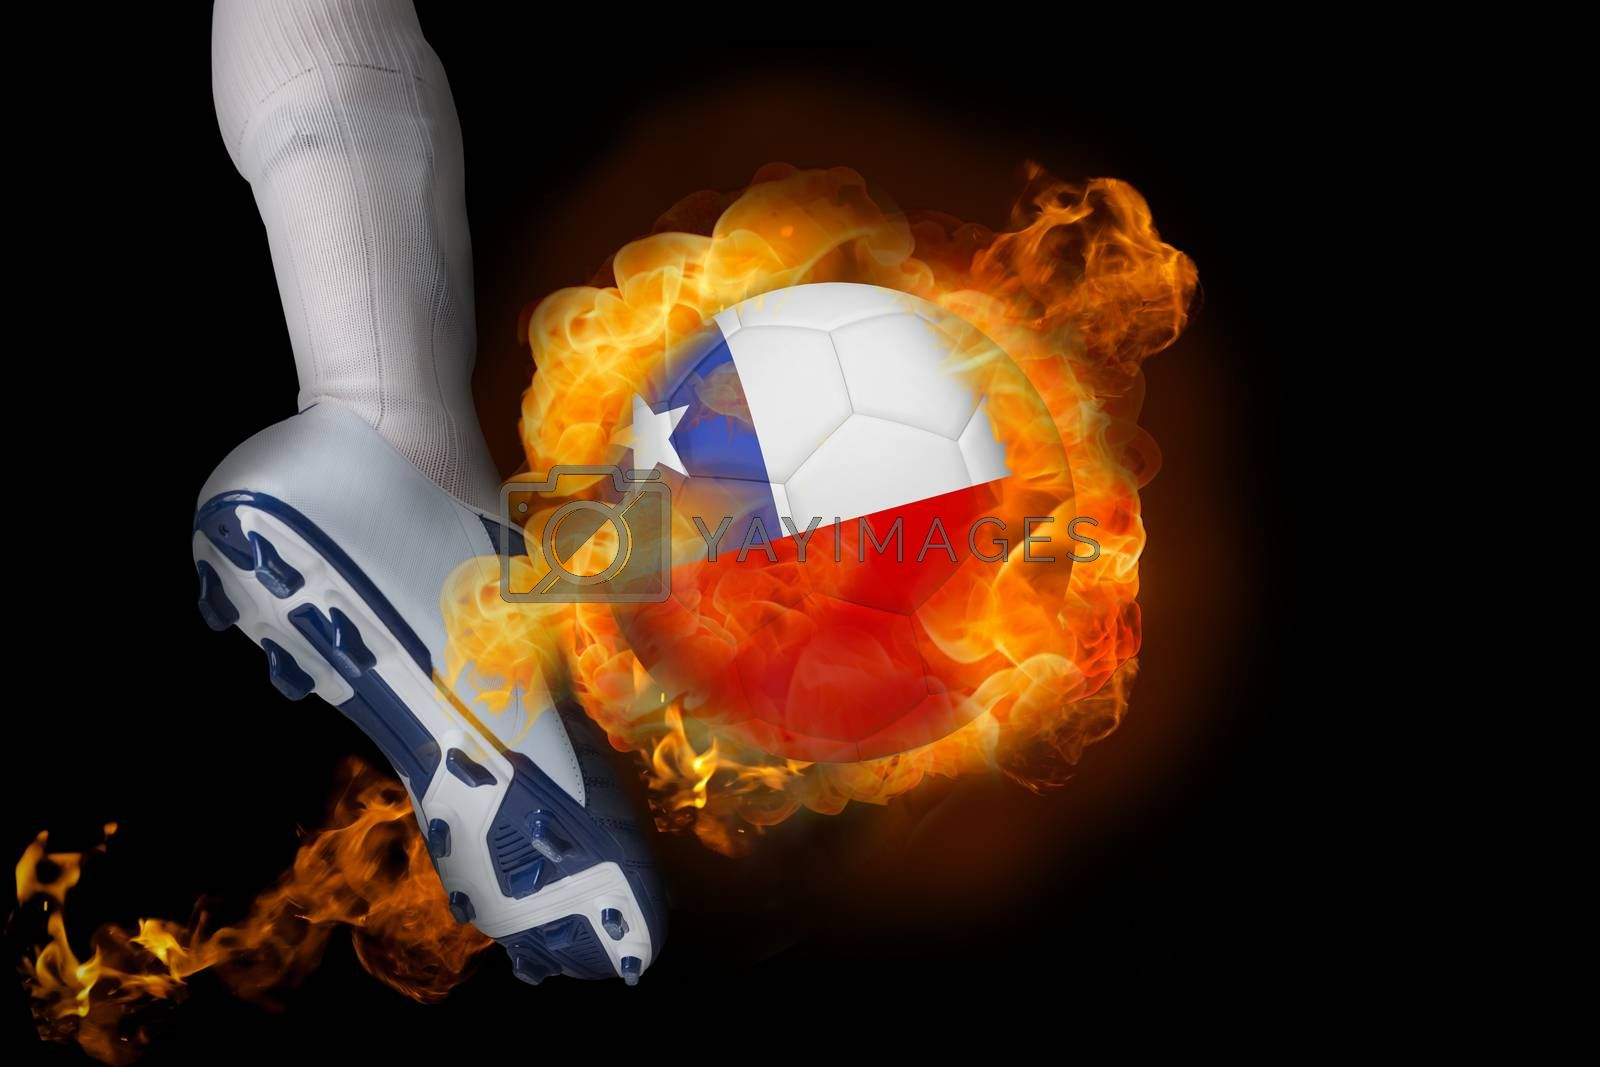 Football player kicking flaming chile ball by Wavebreakmedia